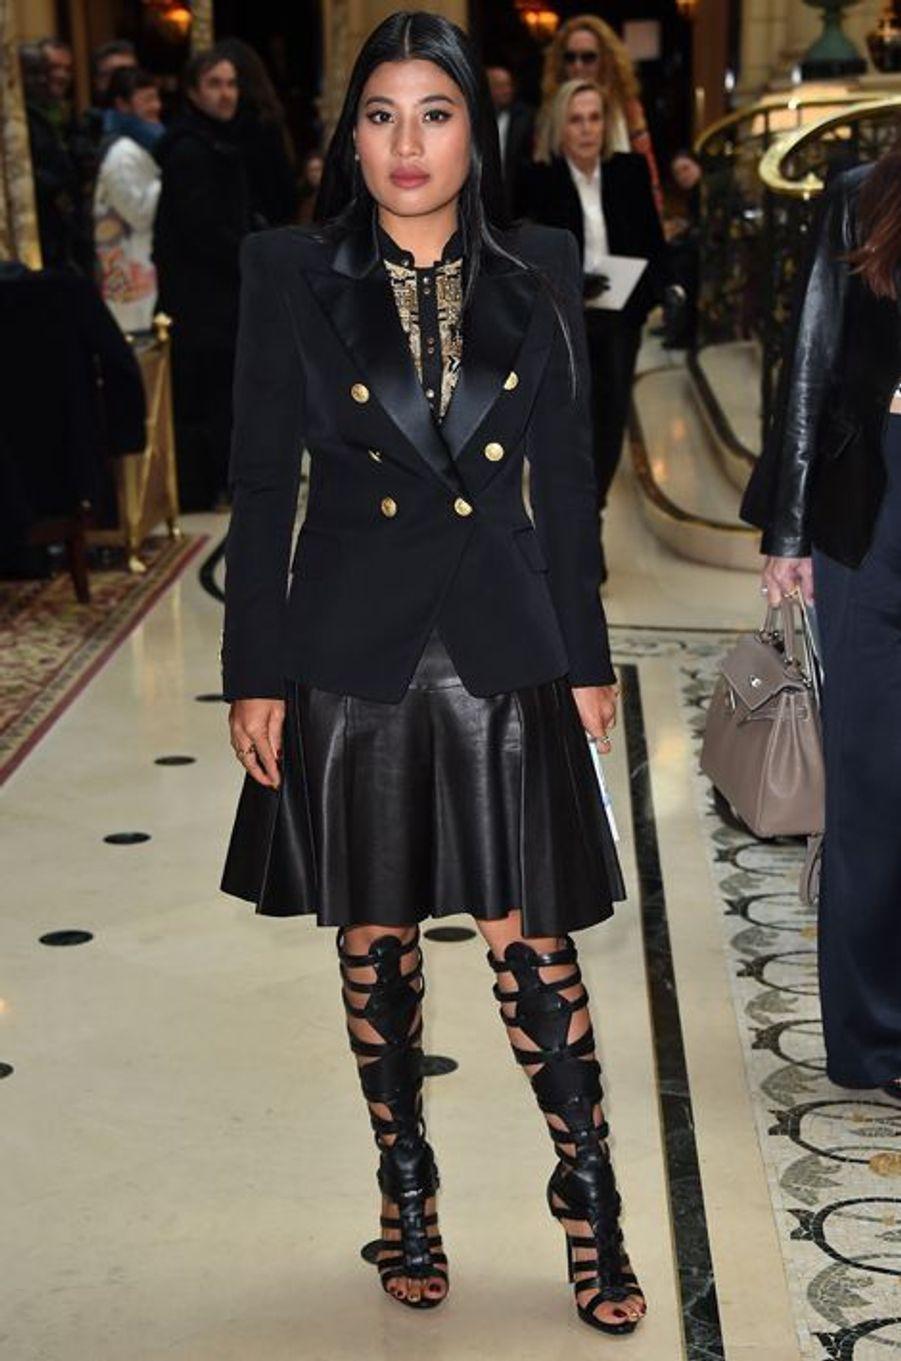 La princesse Sirivannavari Nariratana au défilé Balmain à Paris, le 5 mars 2015